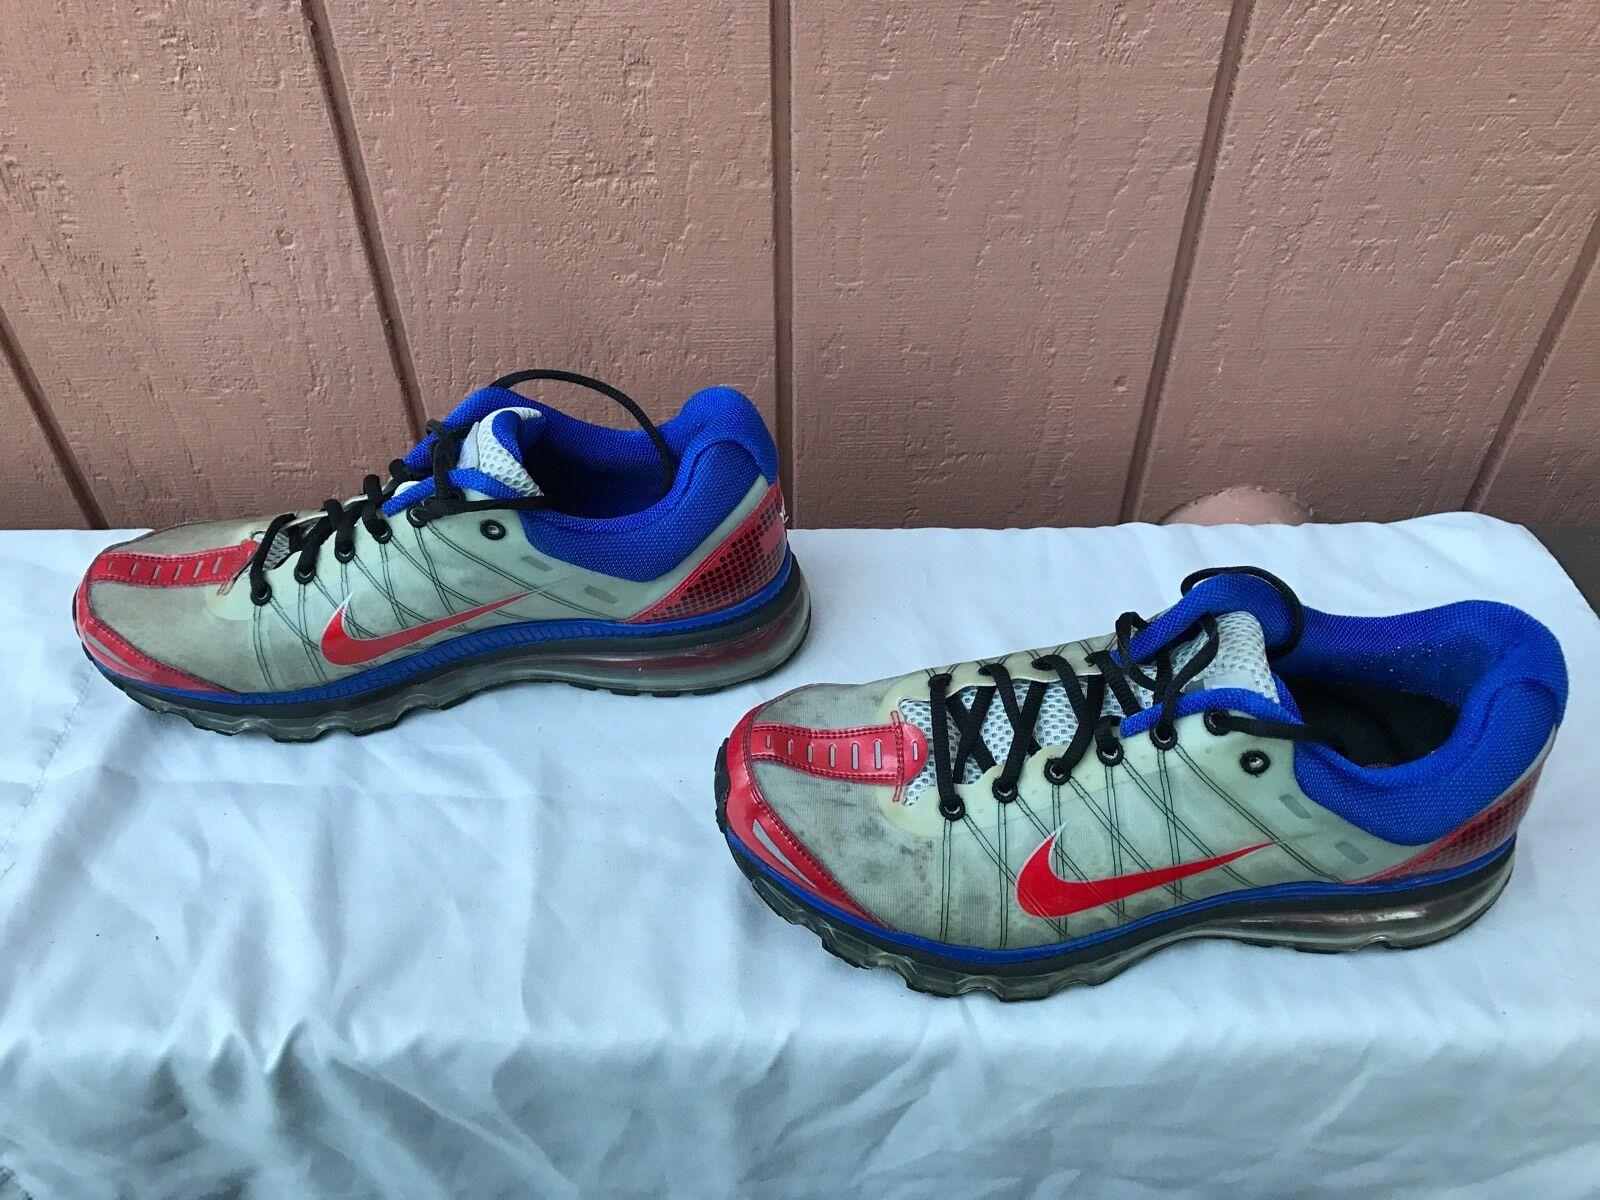 RARE NIKEiD Men's Airmax Gray US Running Sneakers US Gray 10.5 05355f